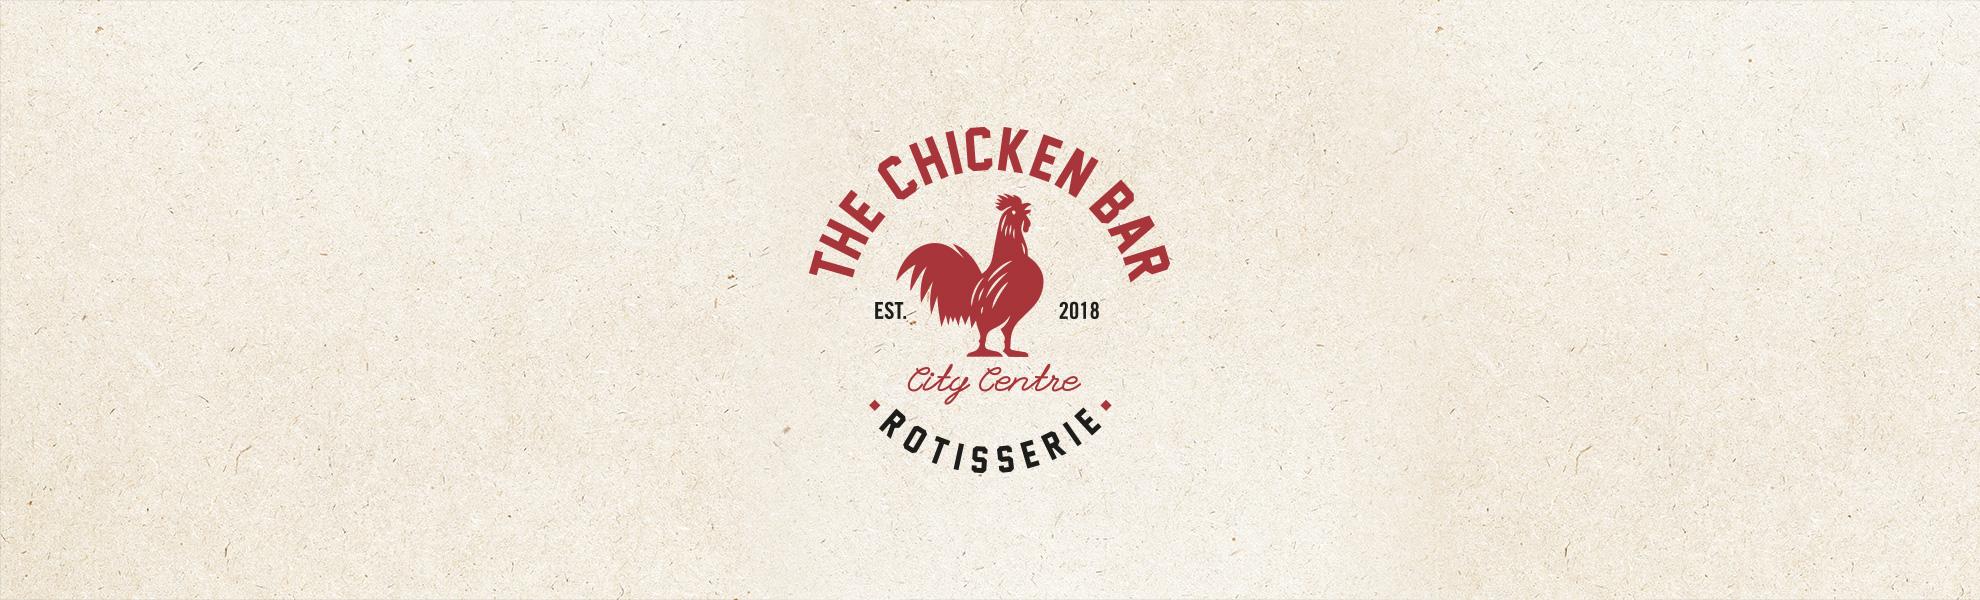 Chicken bar logo